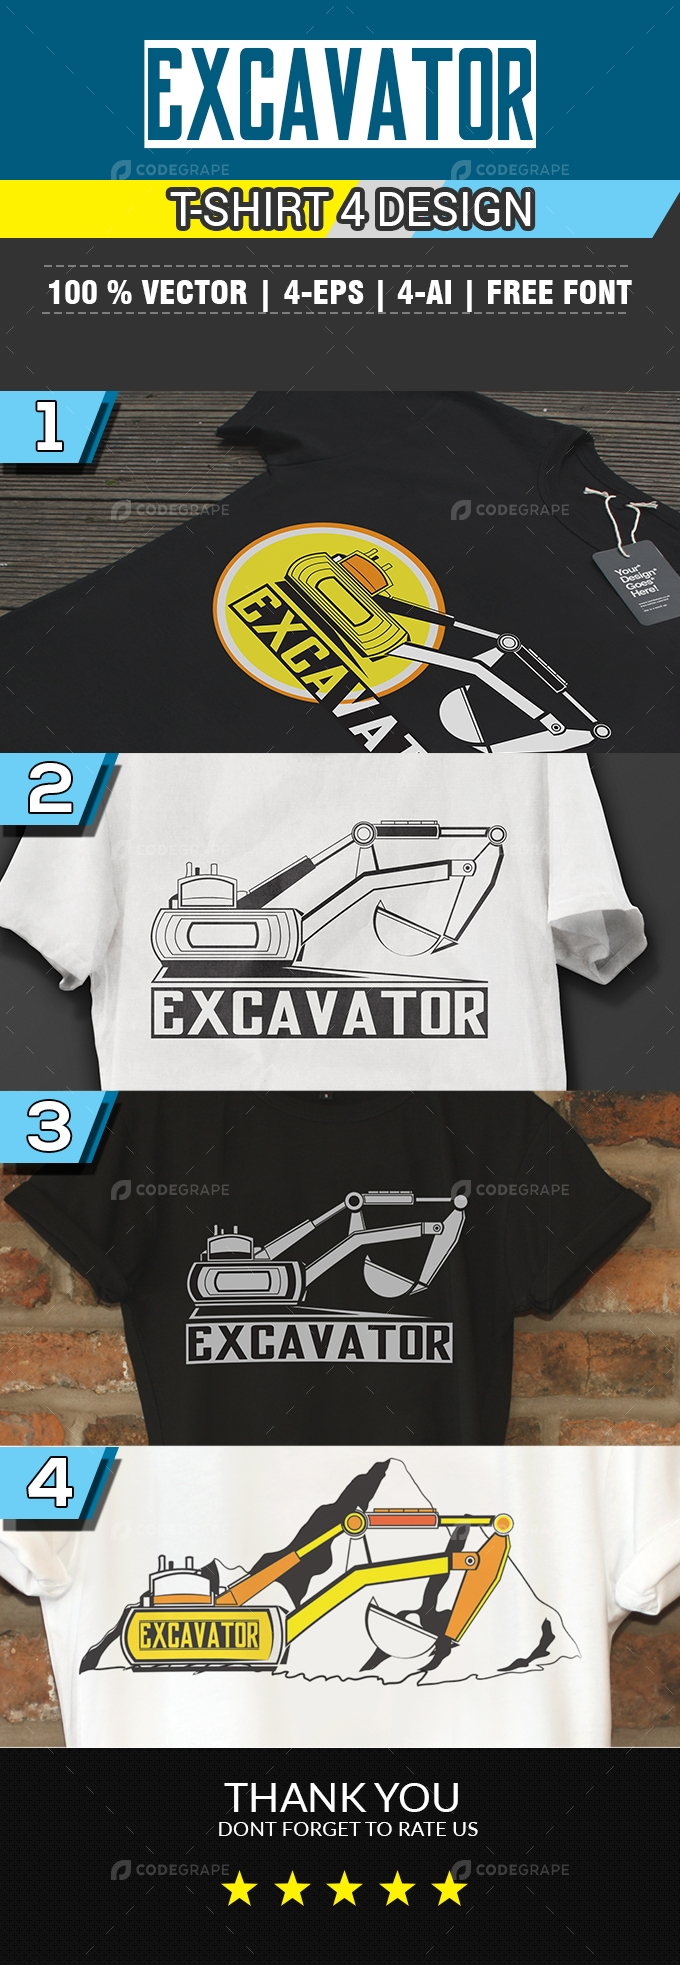 Excavator T-Shirt 4 Design Styles